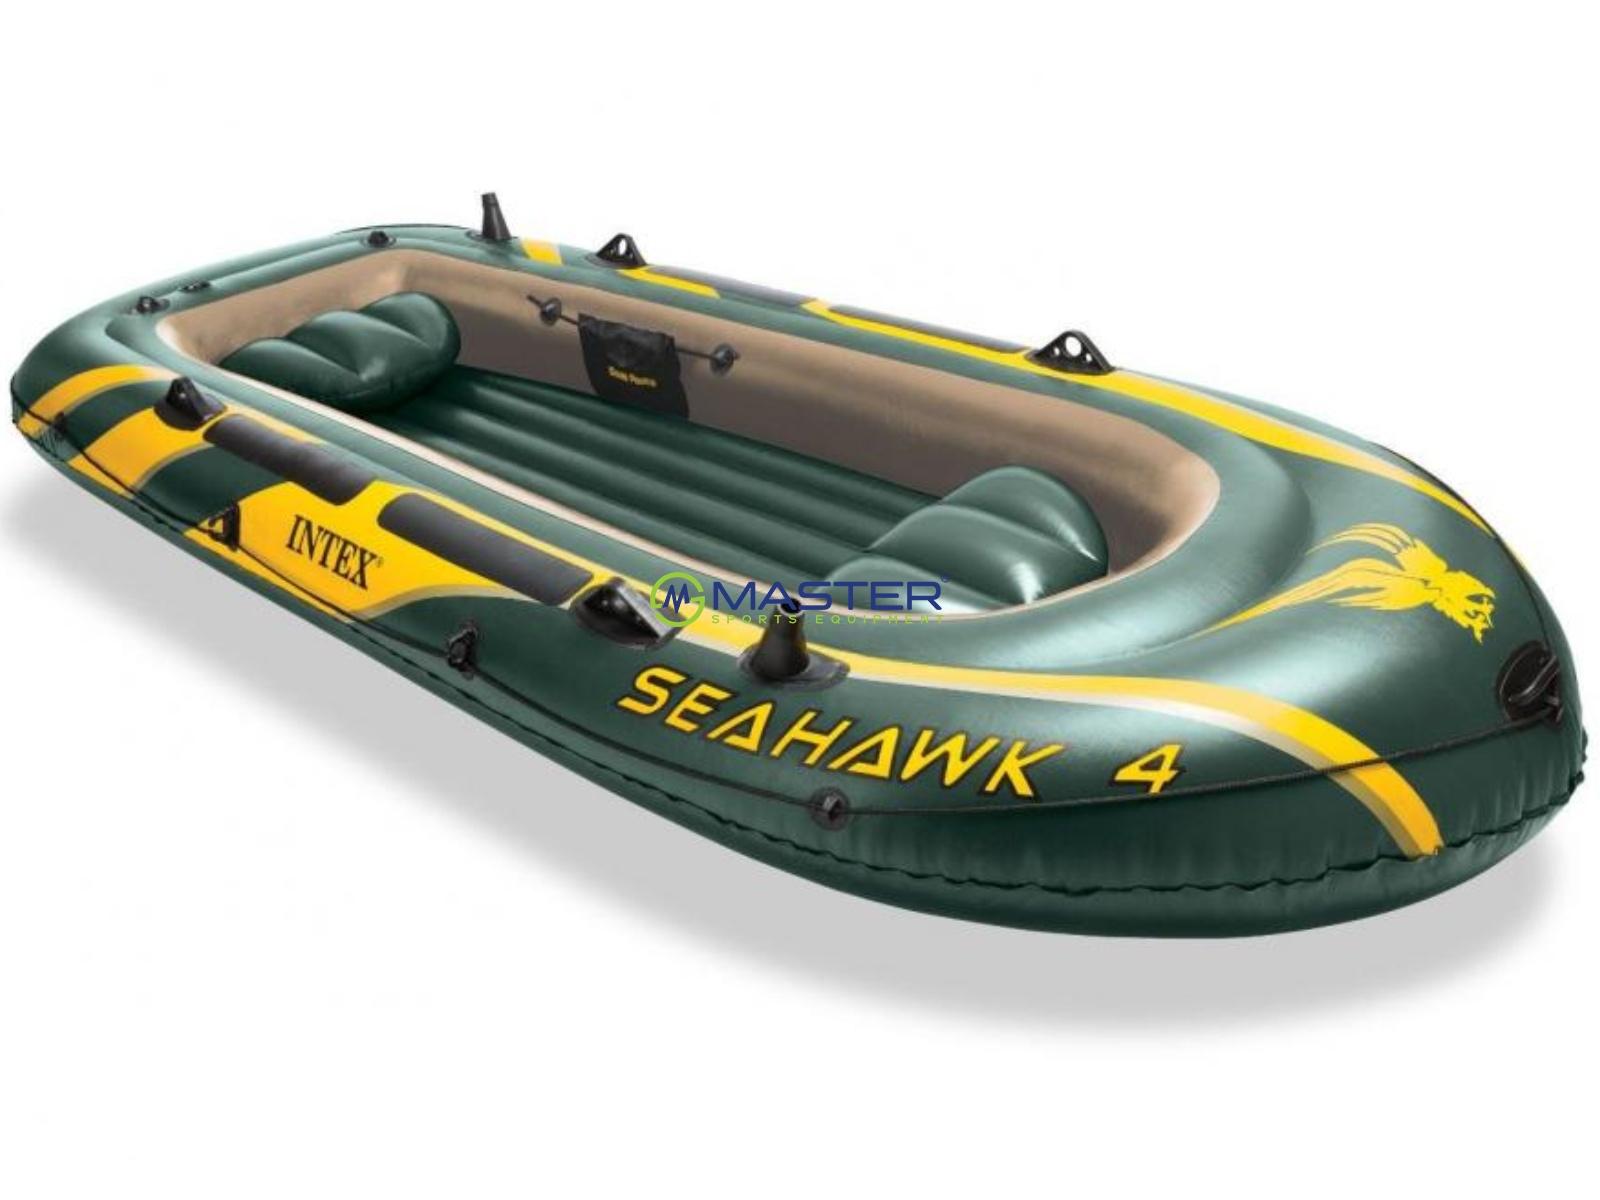 Nafukovací člun INTEX Seahawk 4 - 2. jakost  e46ee5765b3